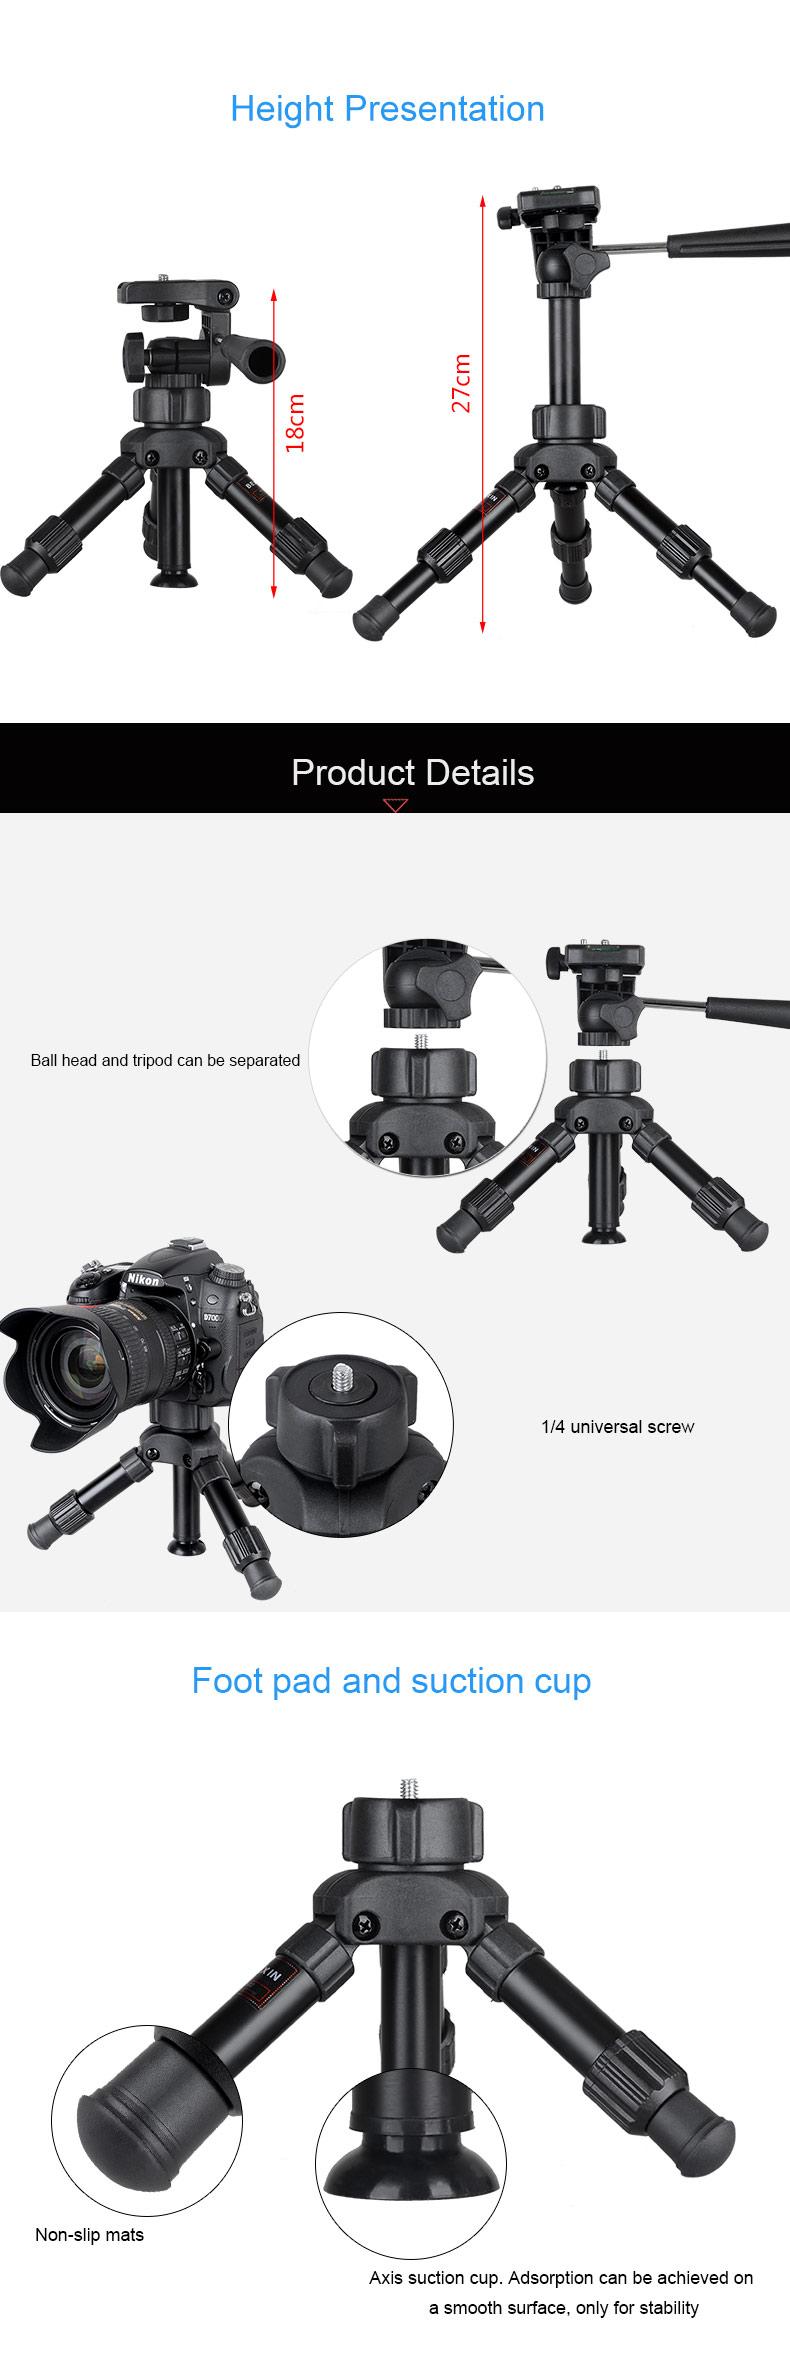 Bakeey MS02 Aluminum Alloy Mini Portable Desktop Tripod Kit 3-Way Ball Head for Live Phone Camera